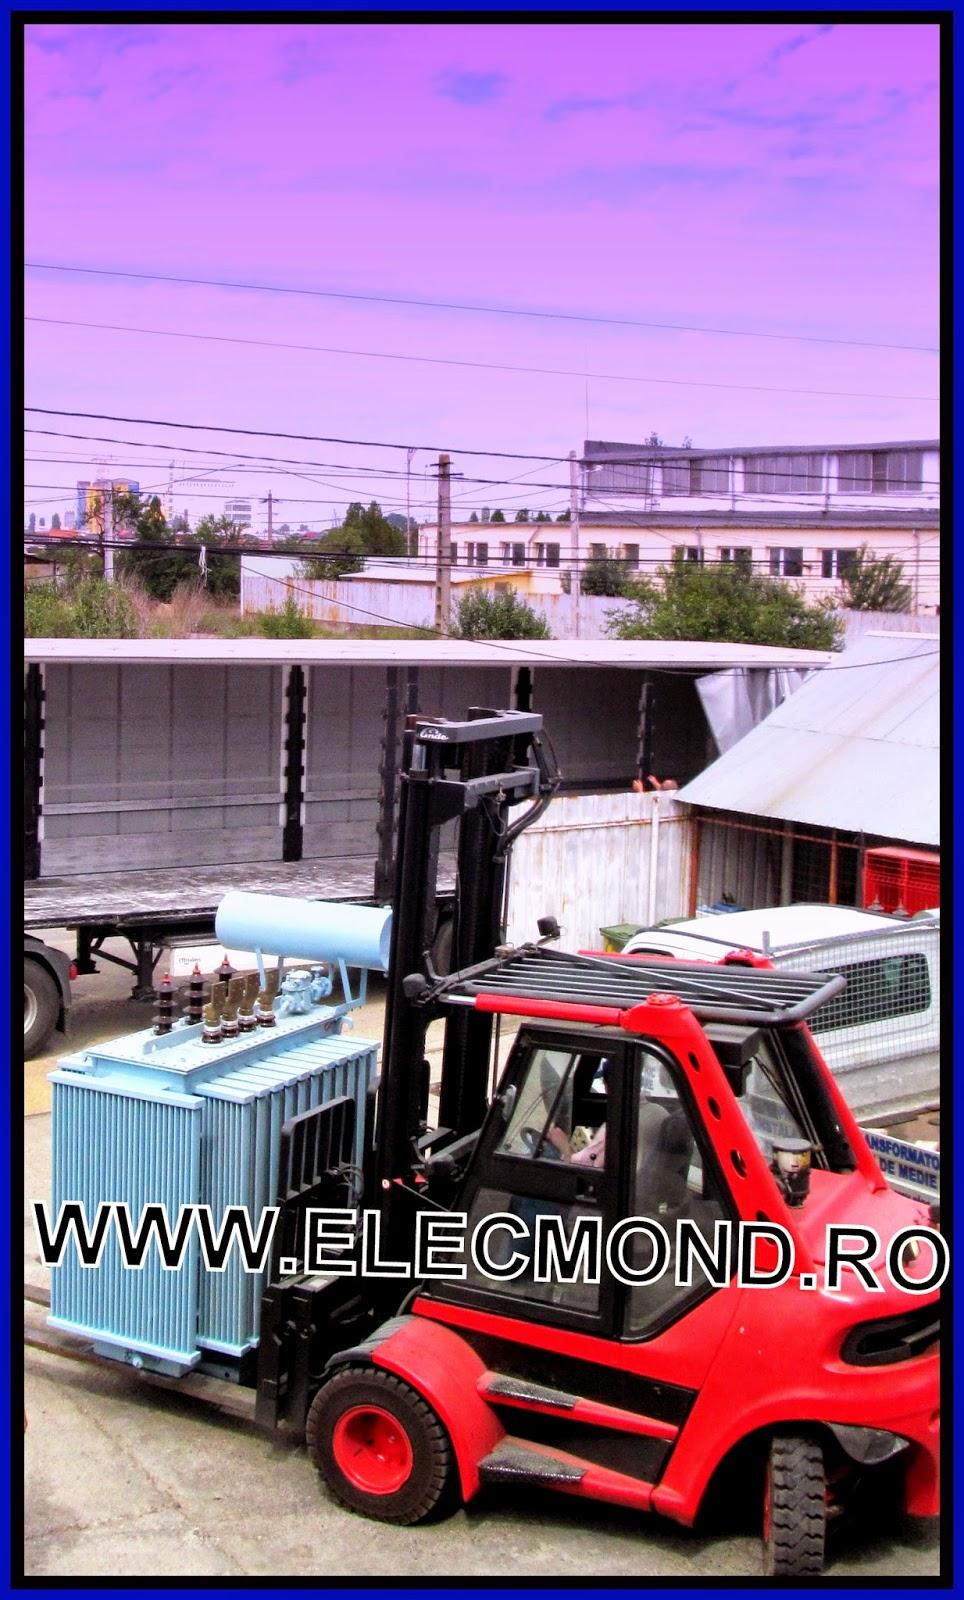 Transformatoare 2000 kVA , 1000 kVA , 1000 kVA  20/0,4kV , transformatoare de putere , transformatoare electrice